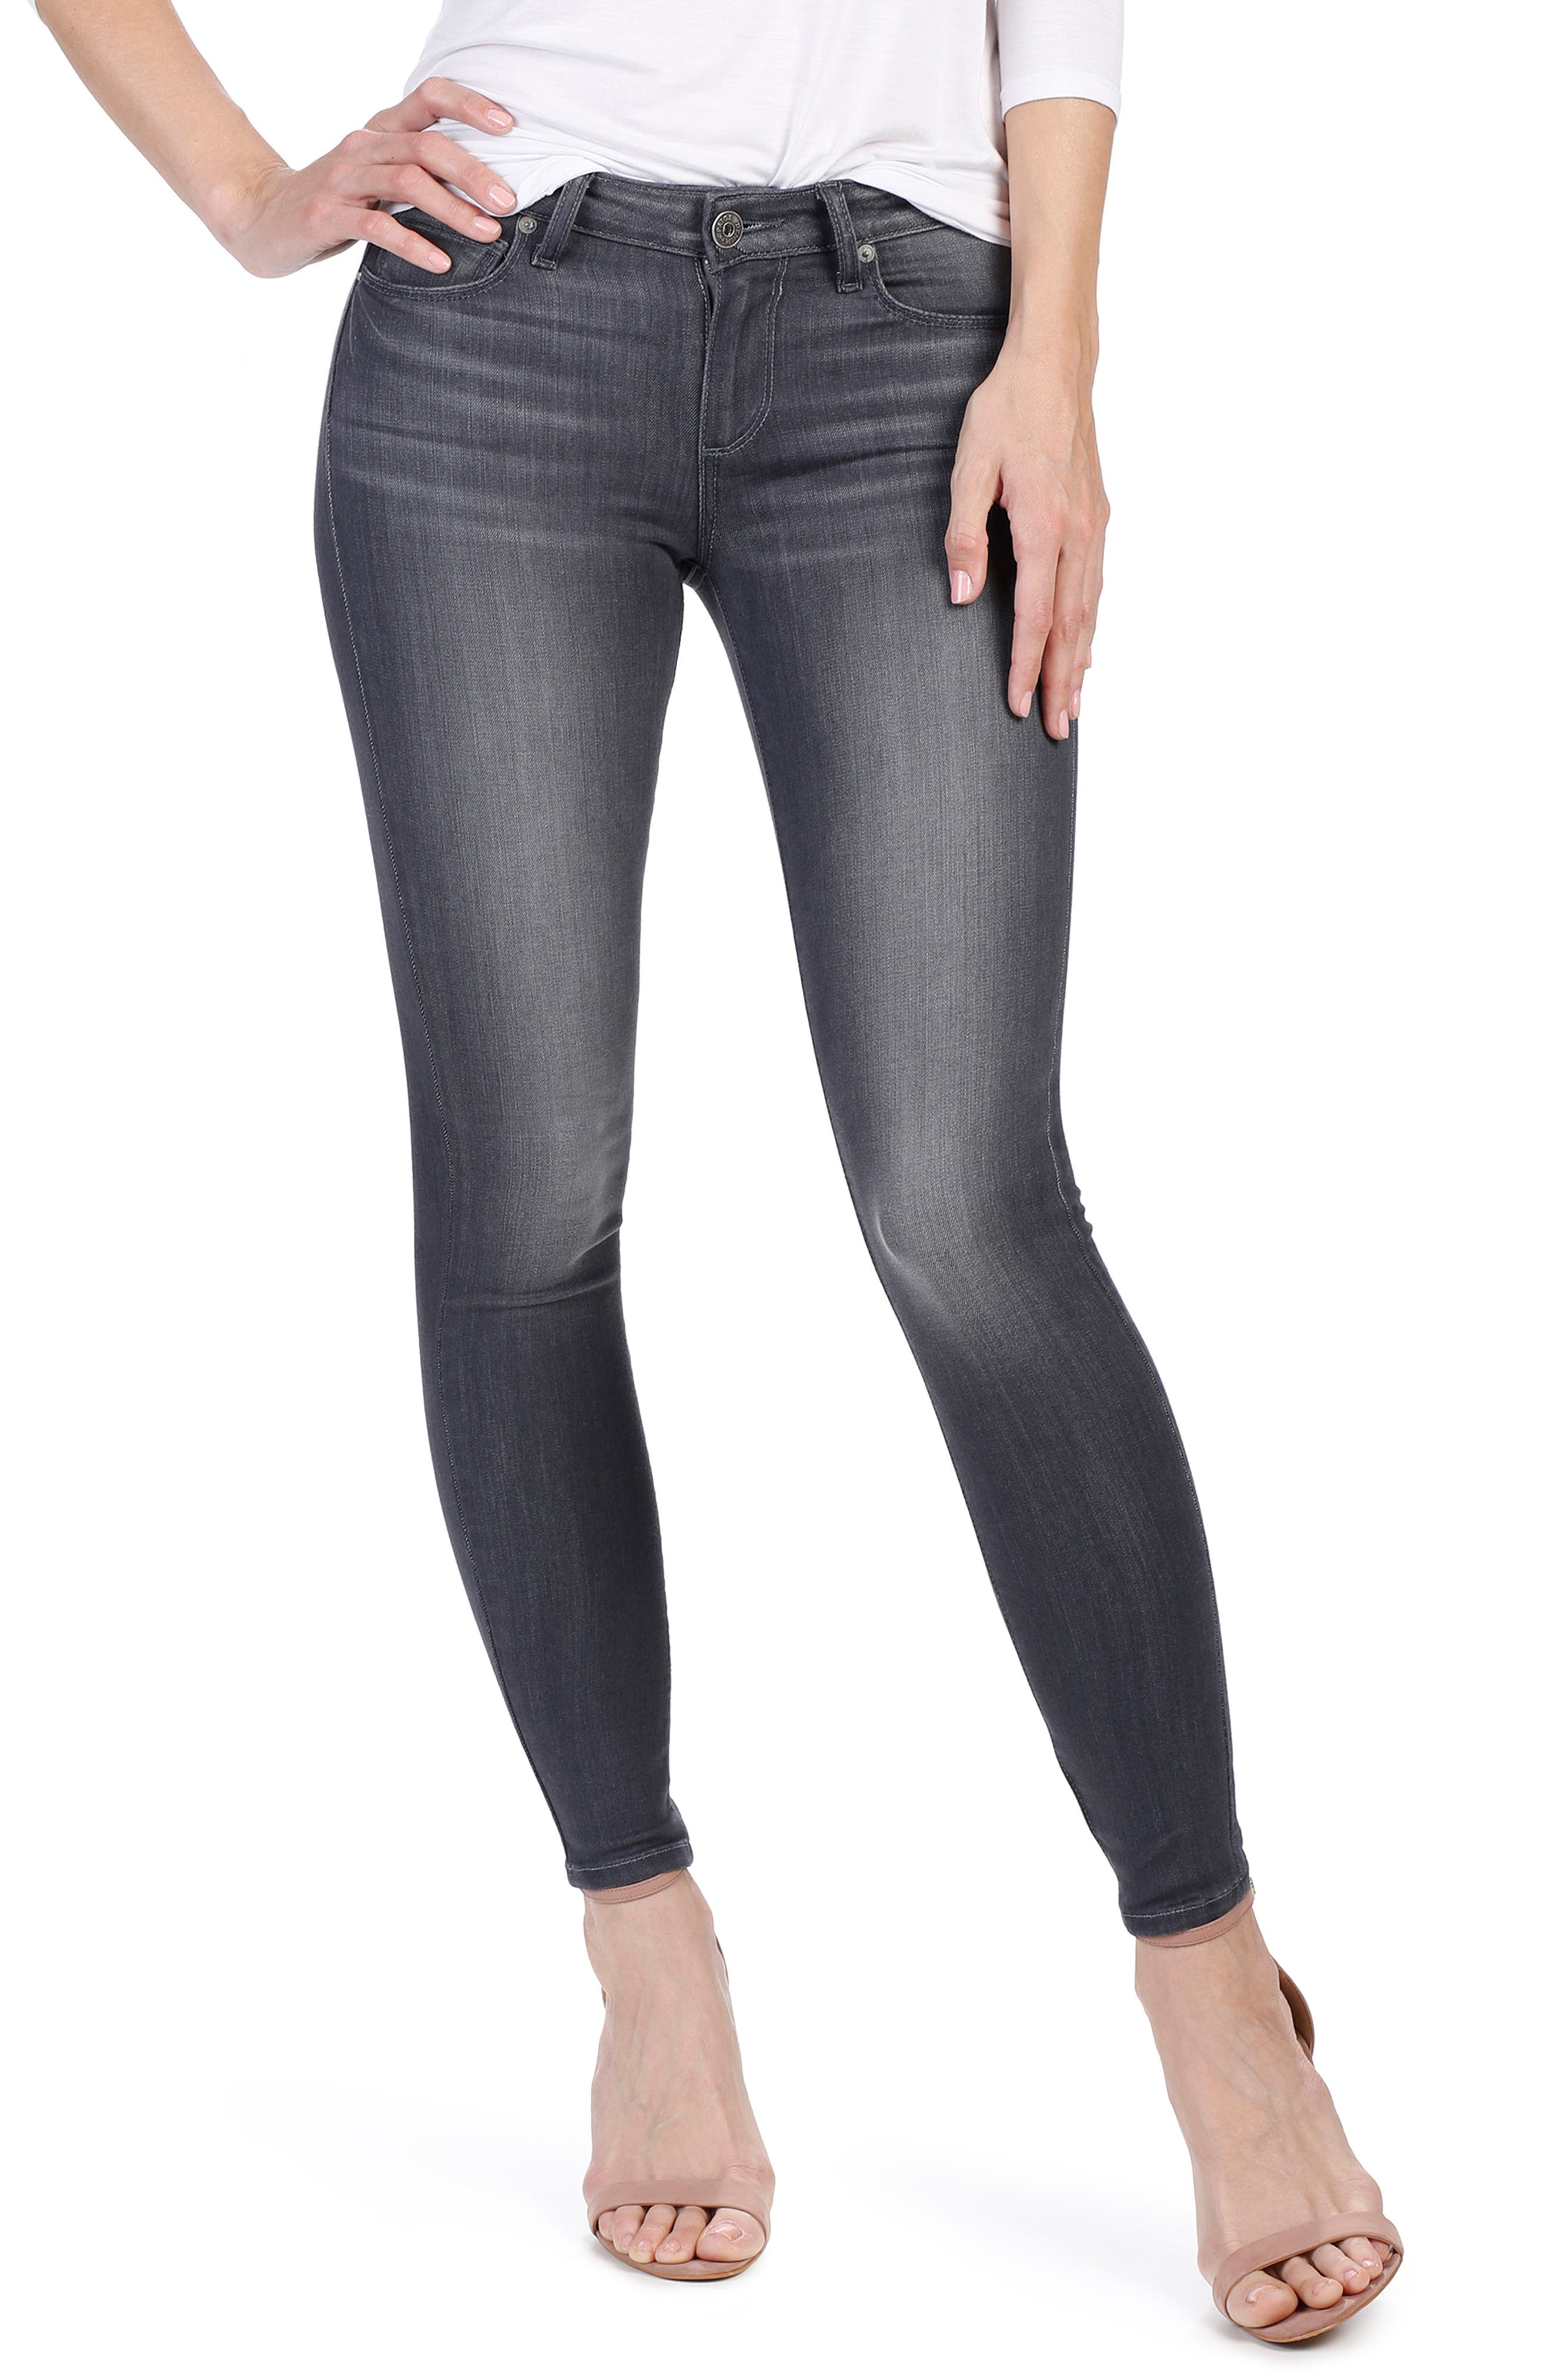 PAIGE Transcend - Verdugo Ankle Skinny Jeans (Summit Grey)